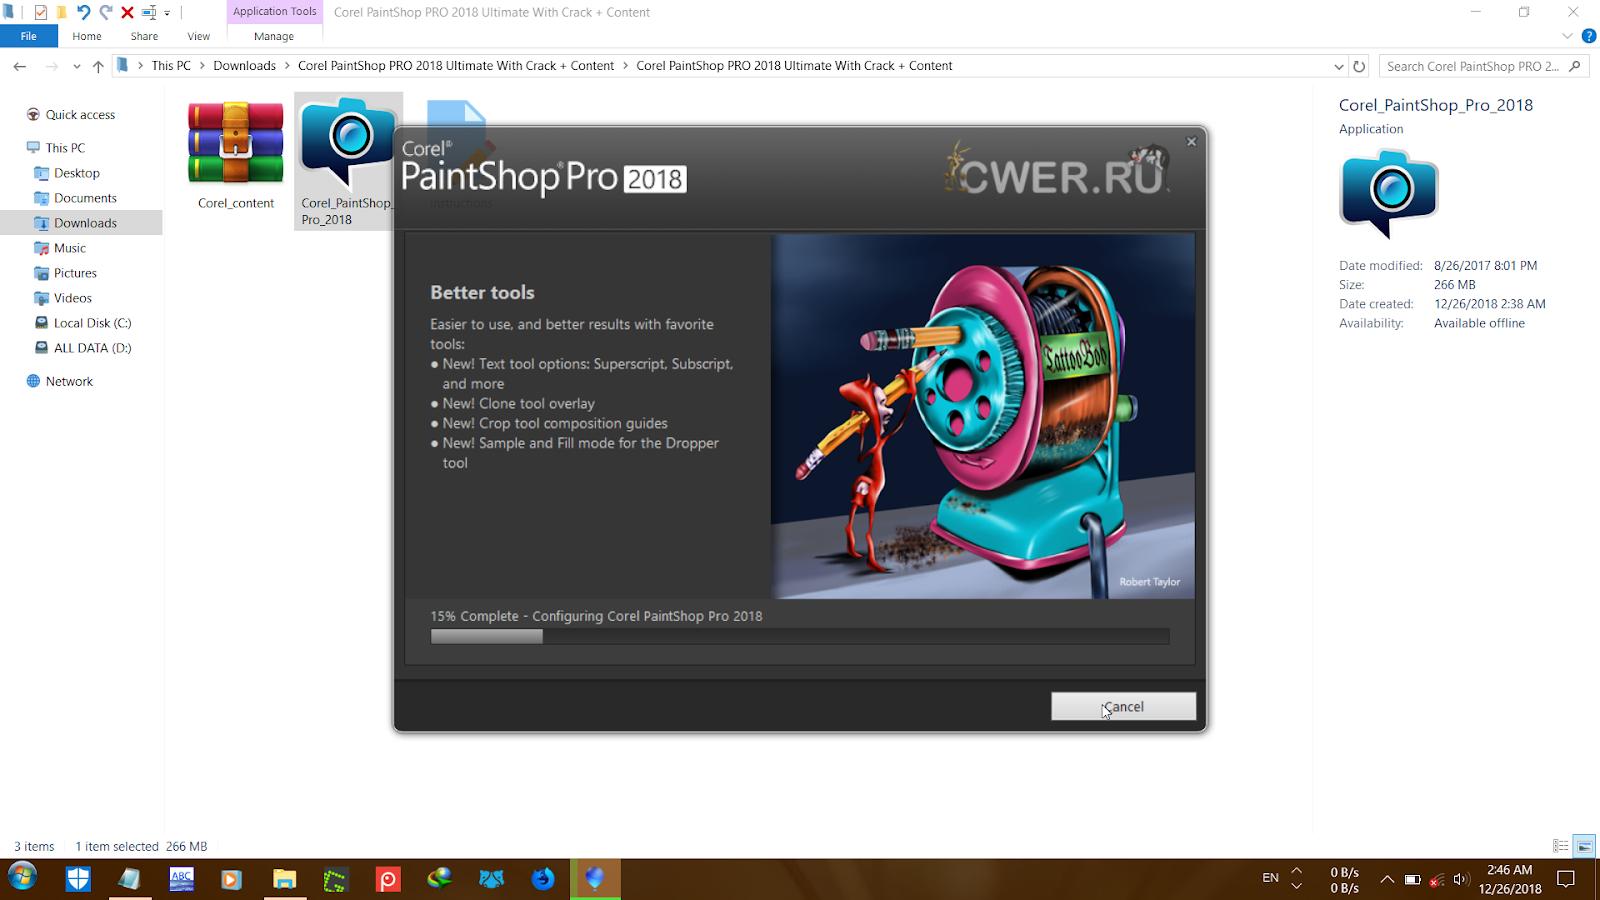 aloneghost-xz : Corel PaintShop PRO 2018 Ultimate With Crack + Content